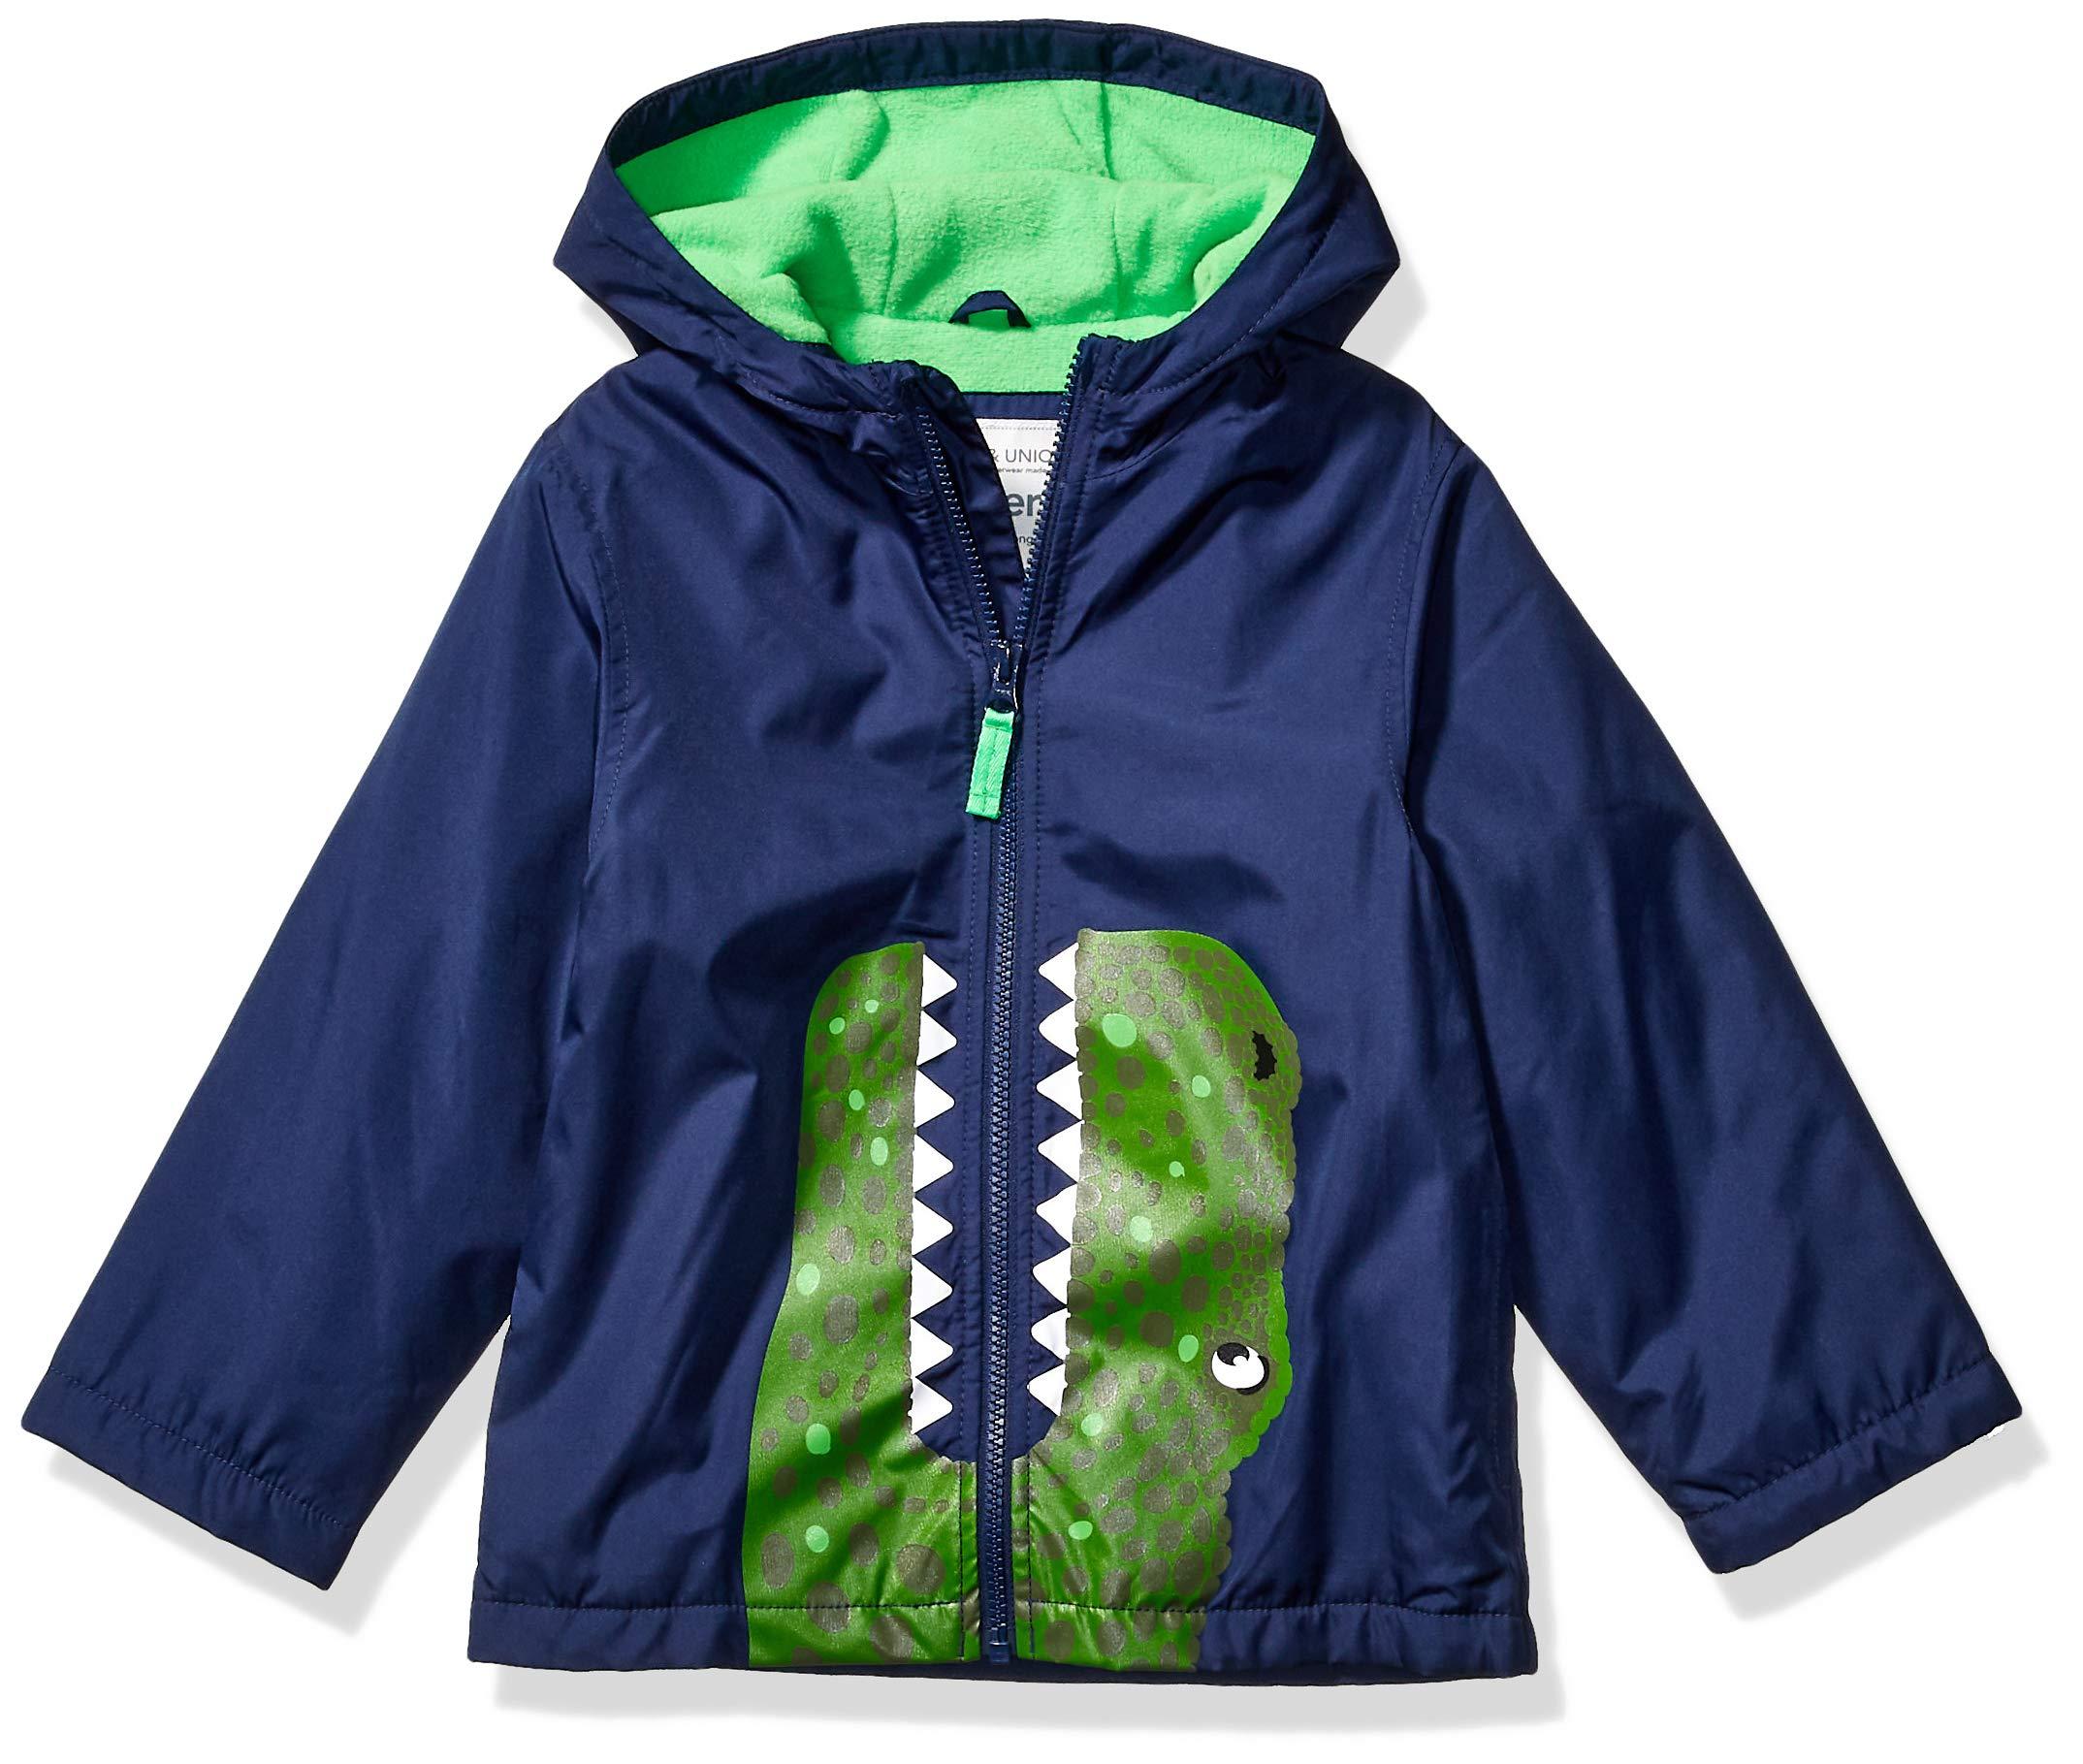 Carter's Boys' Little Perfect Midweight Jacket Coat